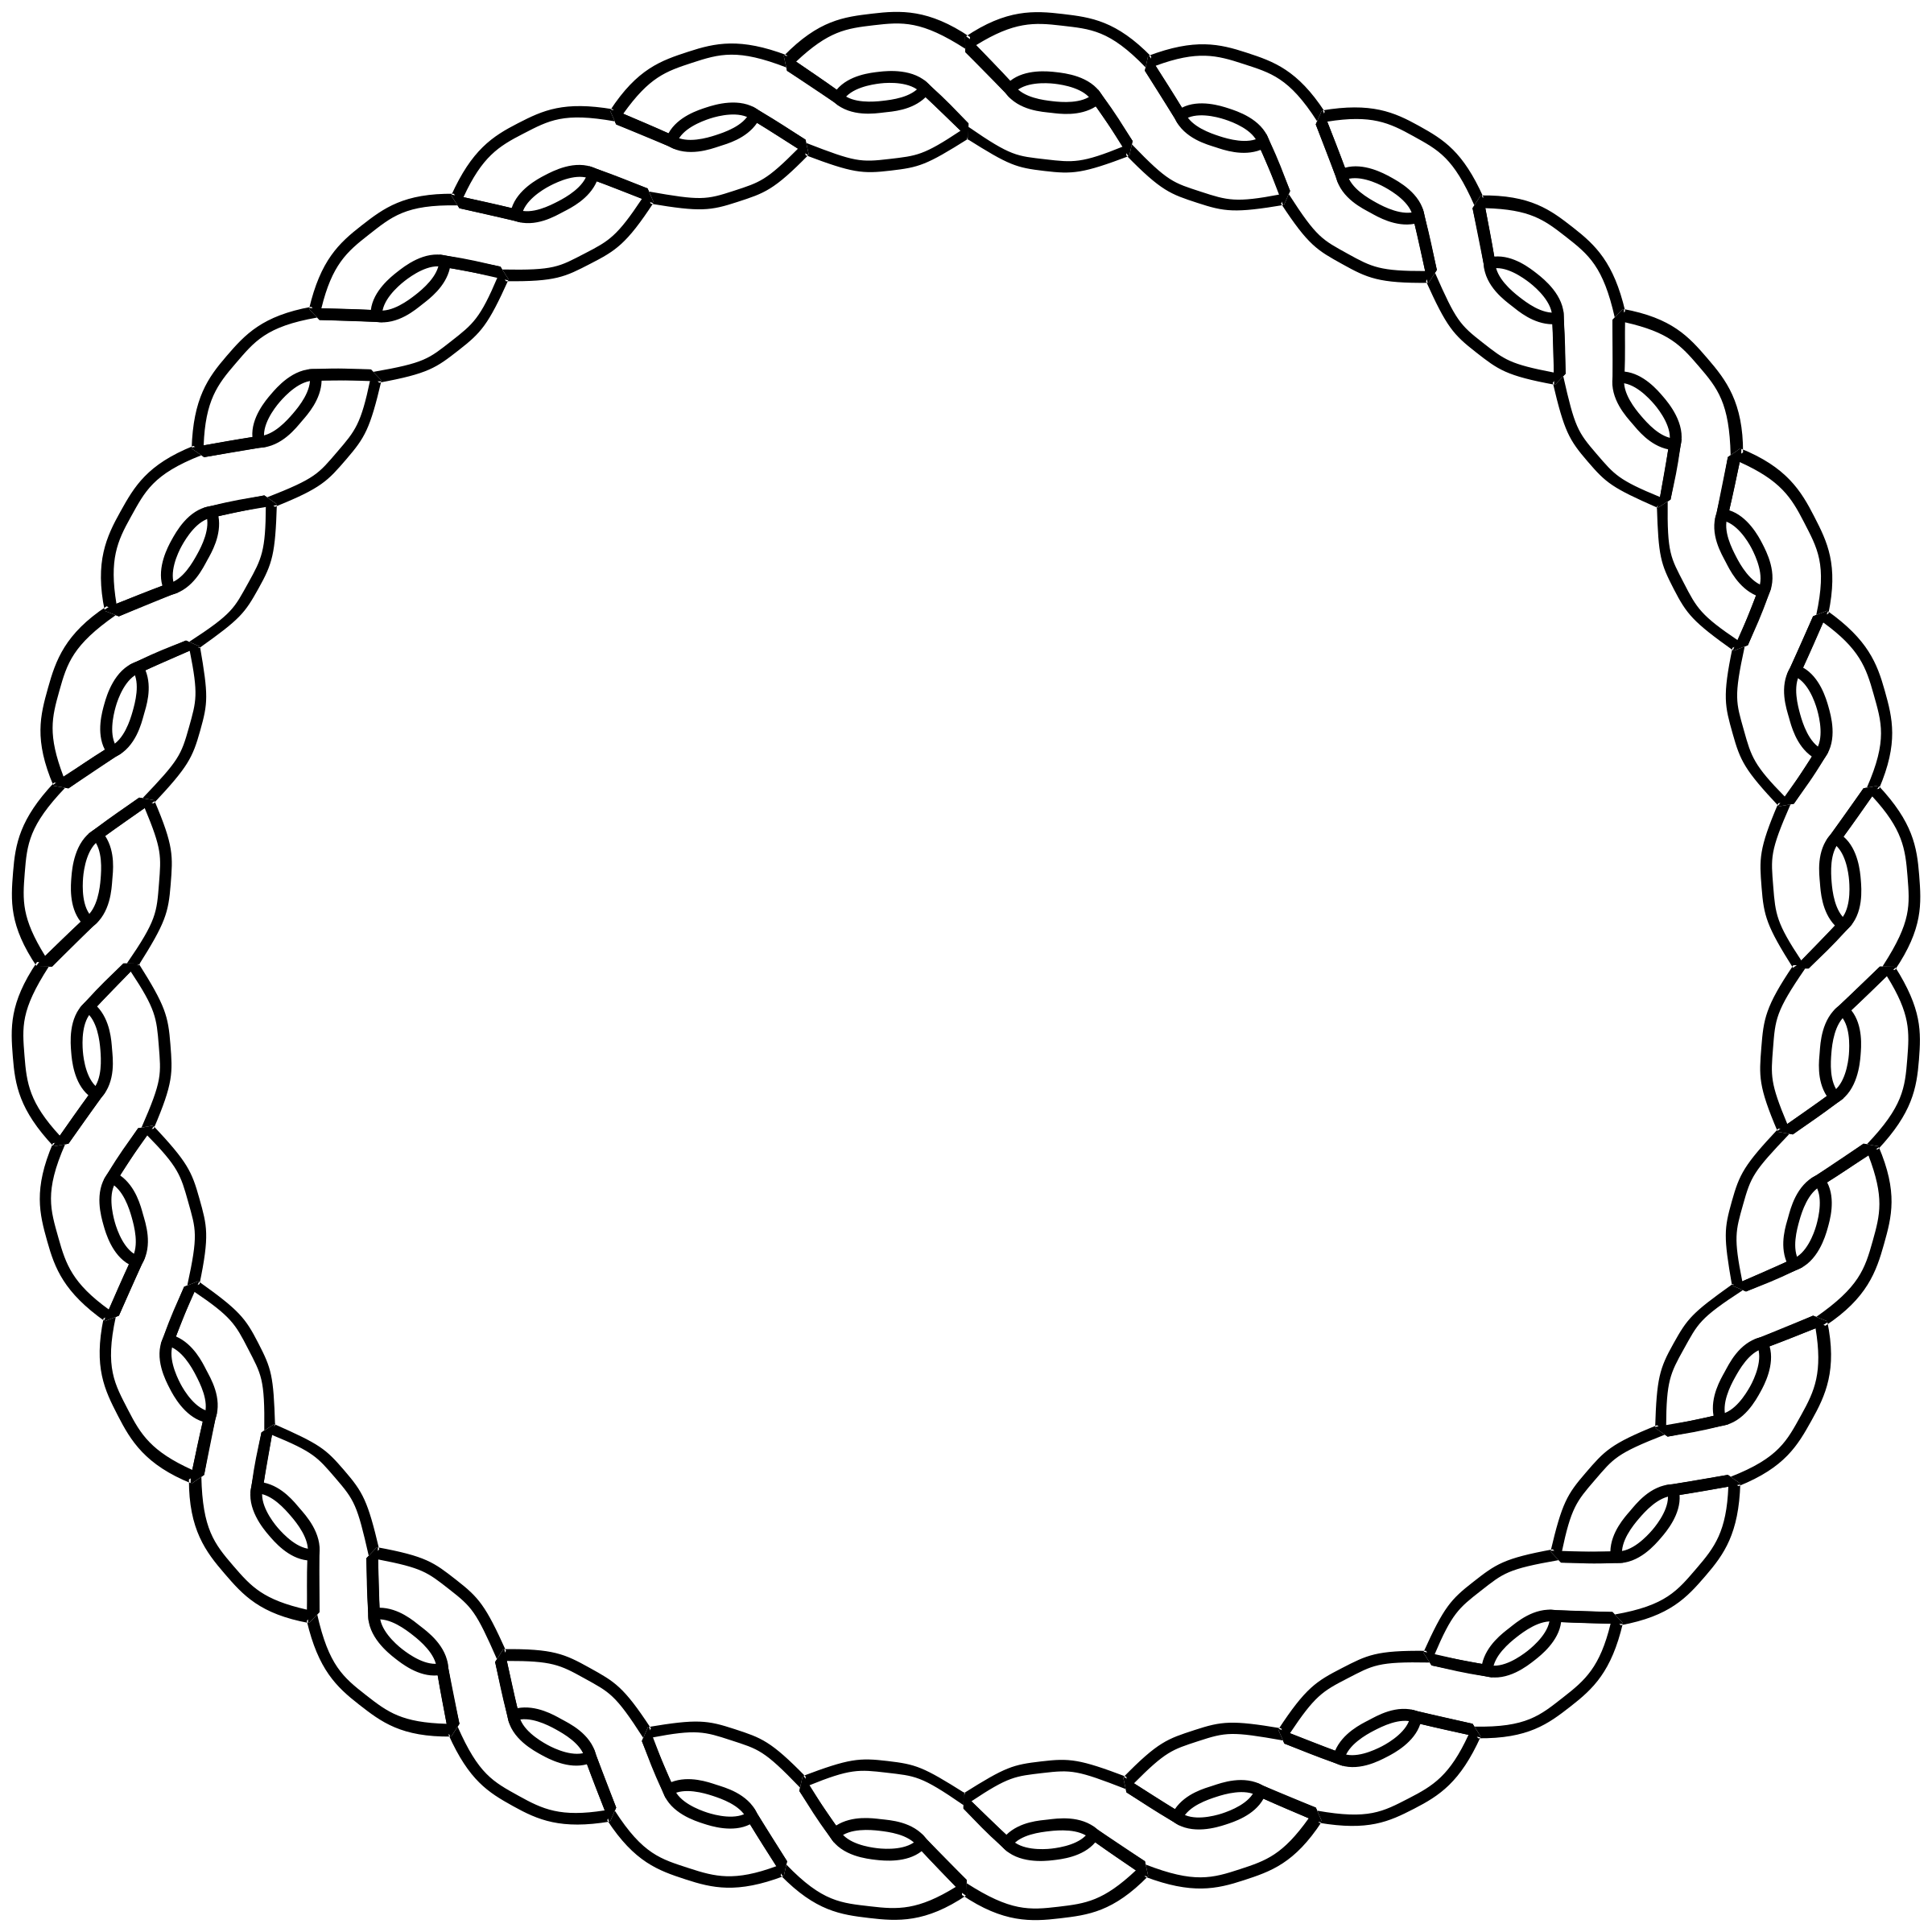 Clipart circle braided, Clipart circle braided Transparent.